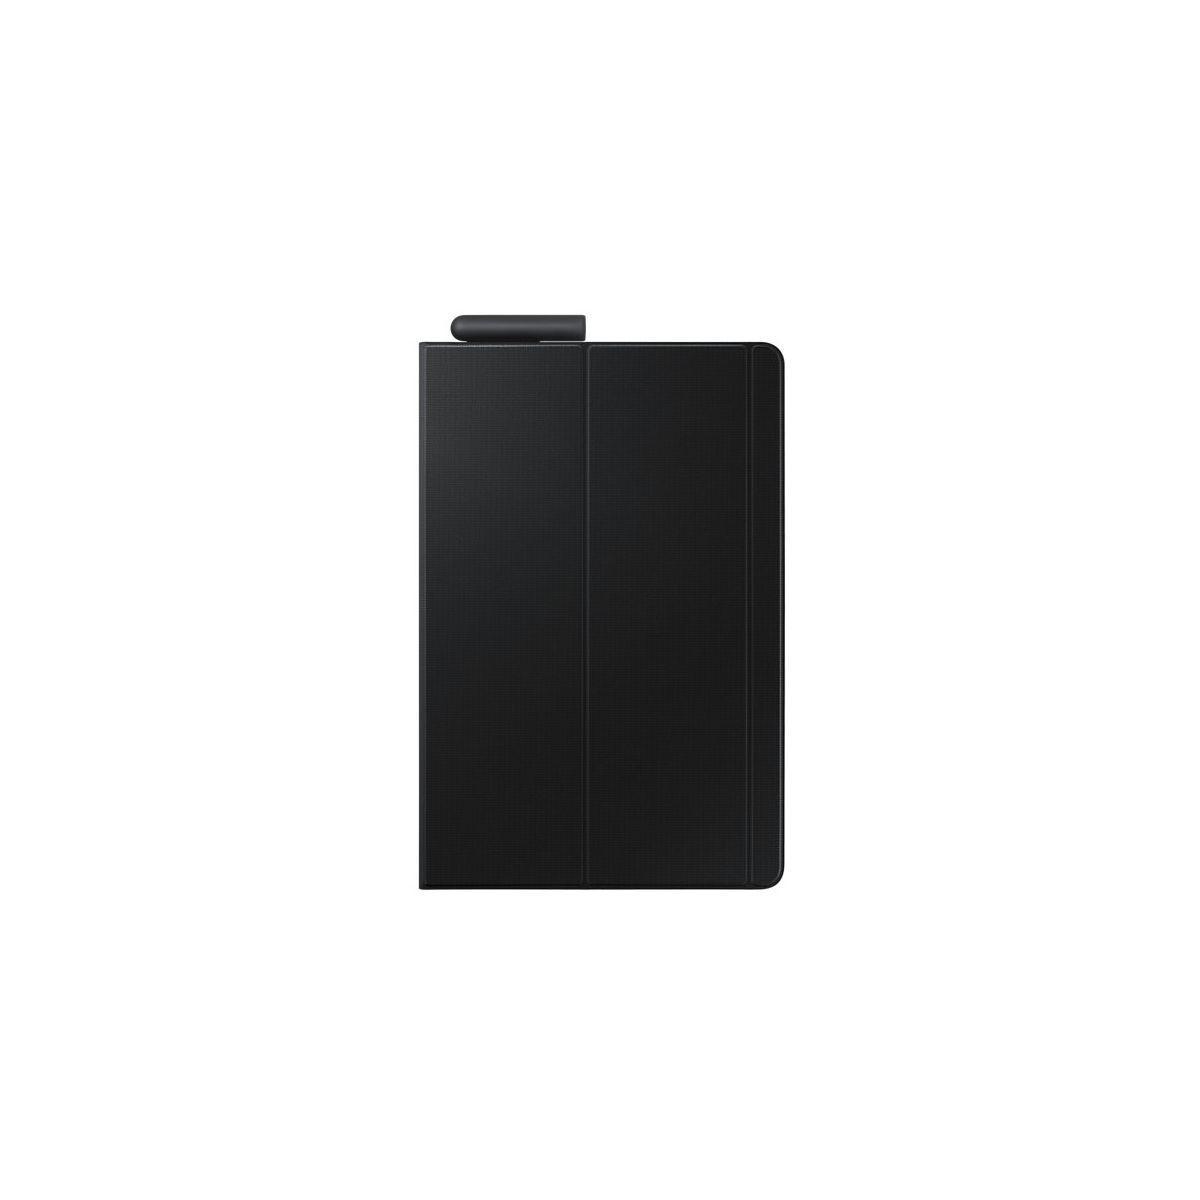 Etui tablette samsung tab s4 noir (photo)